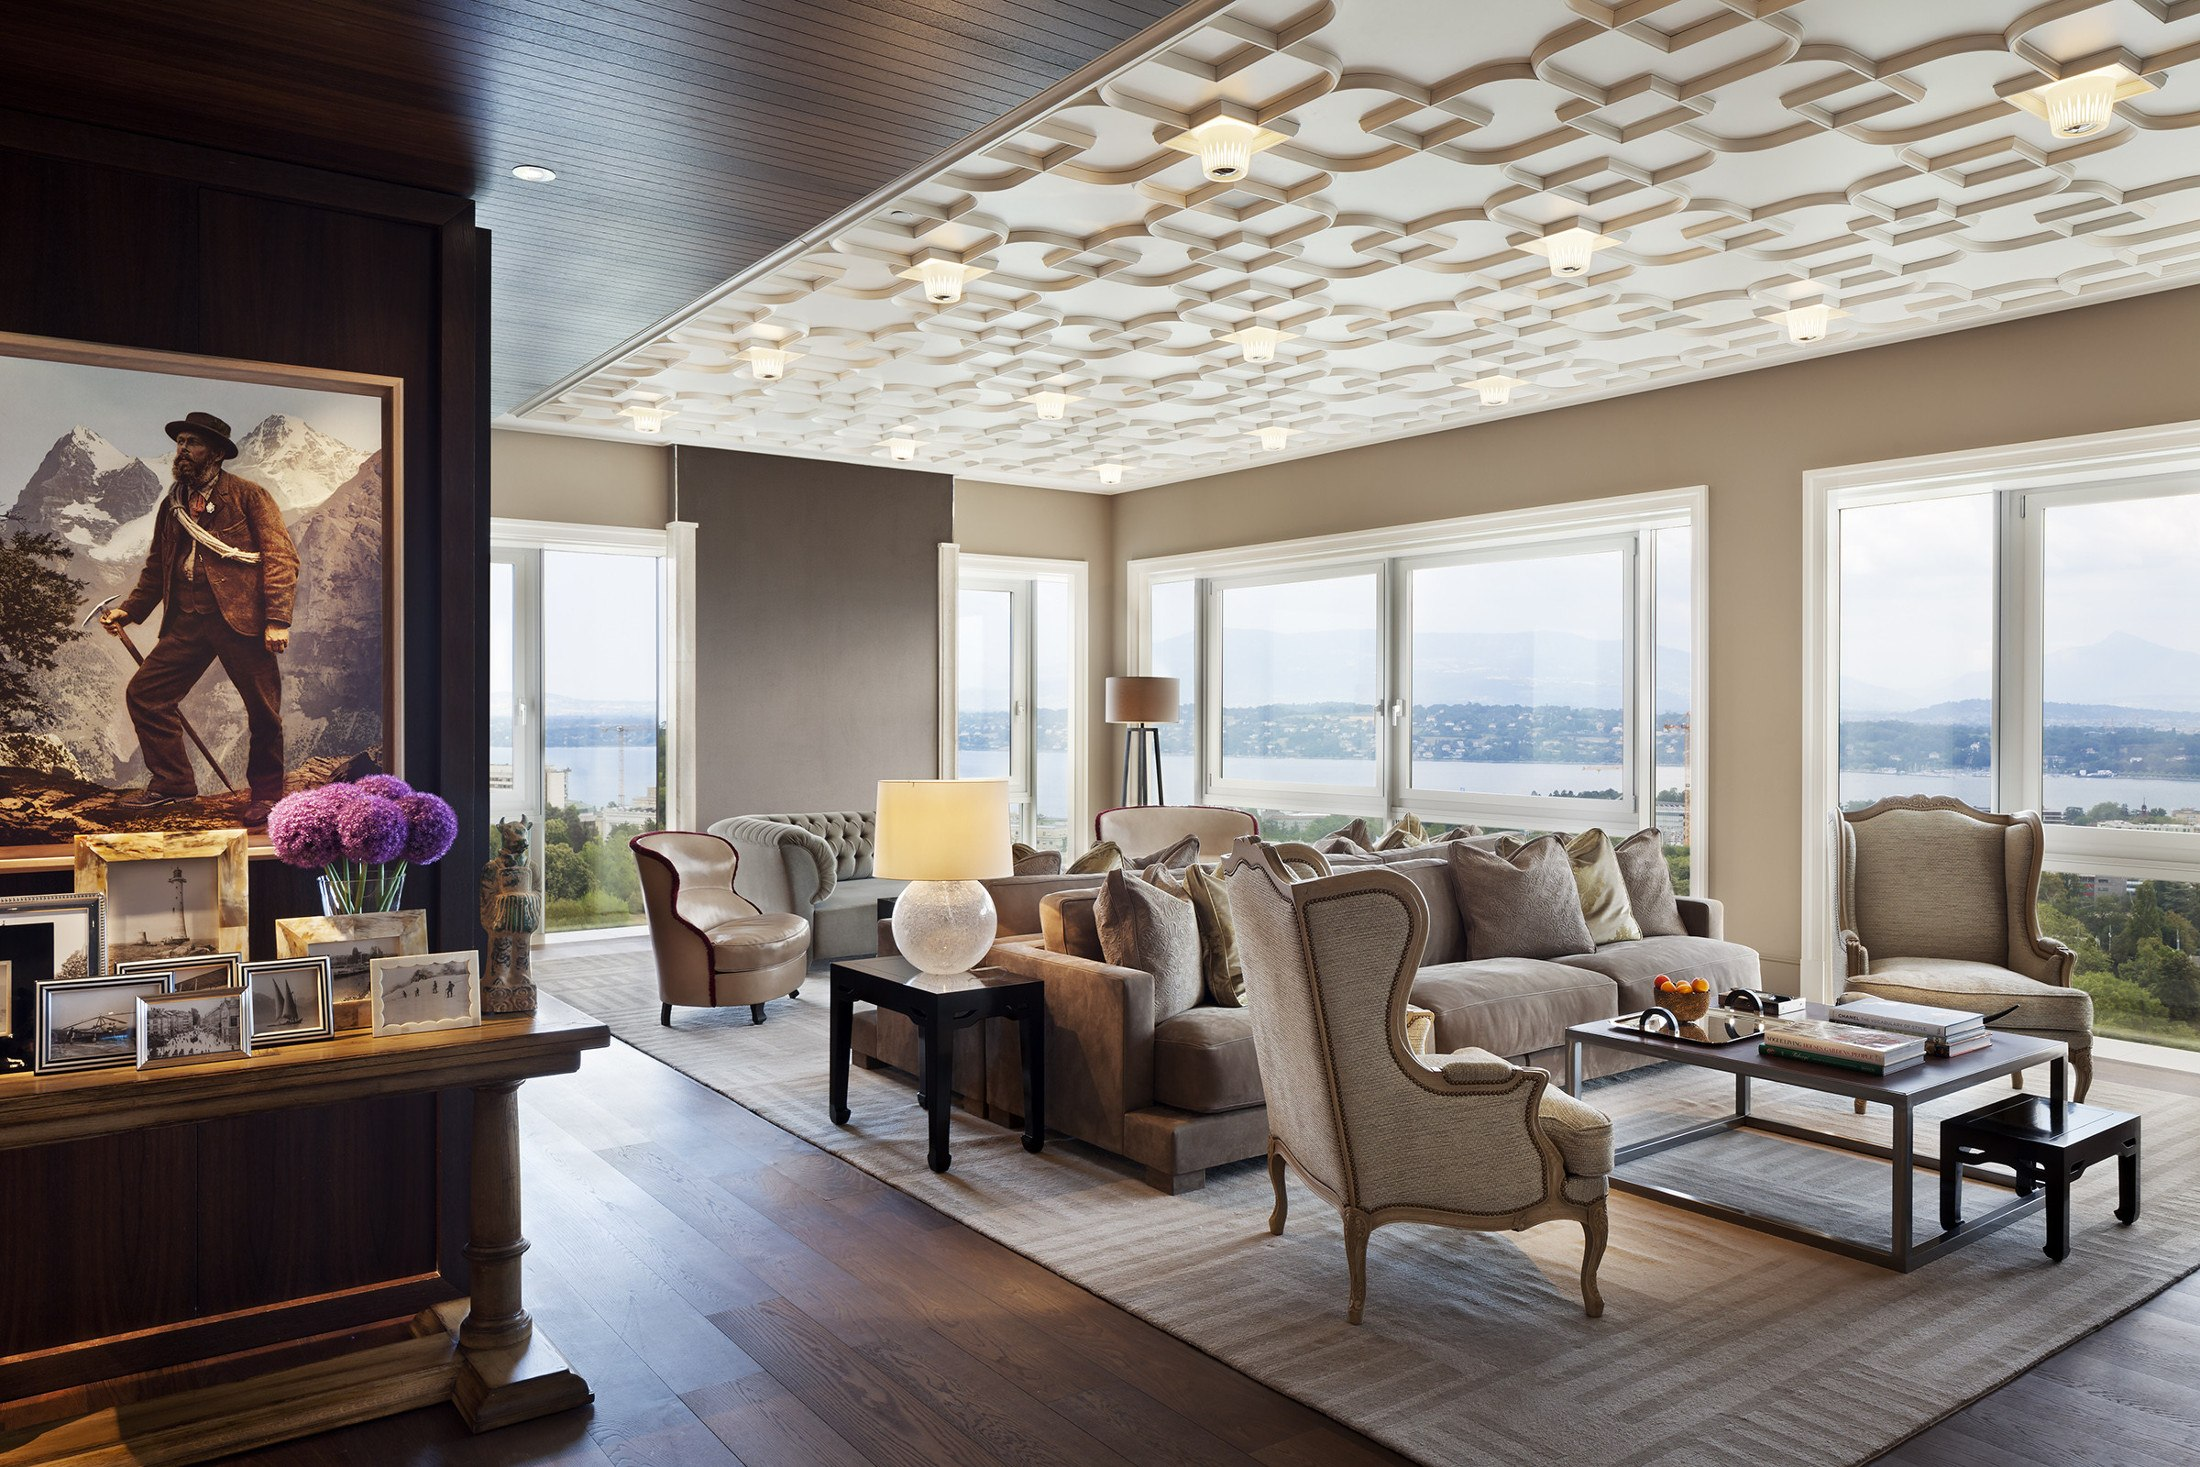 InterContinental-Geneva-Hotel-the-residence-2